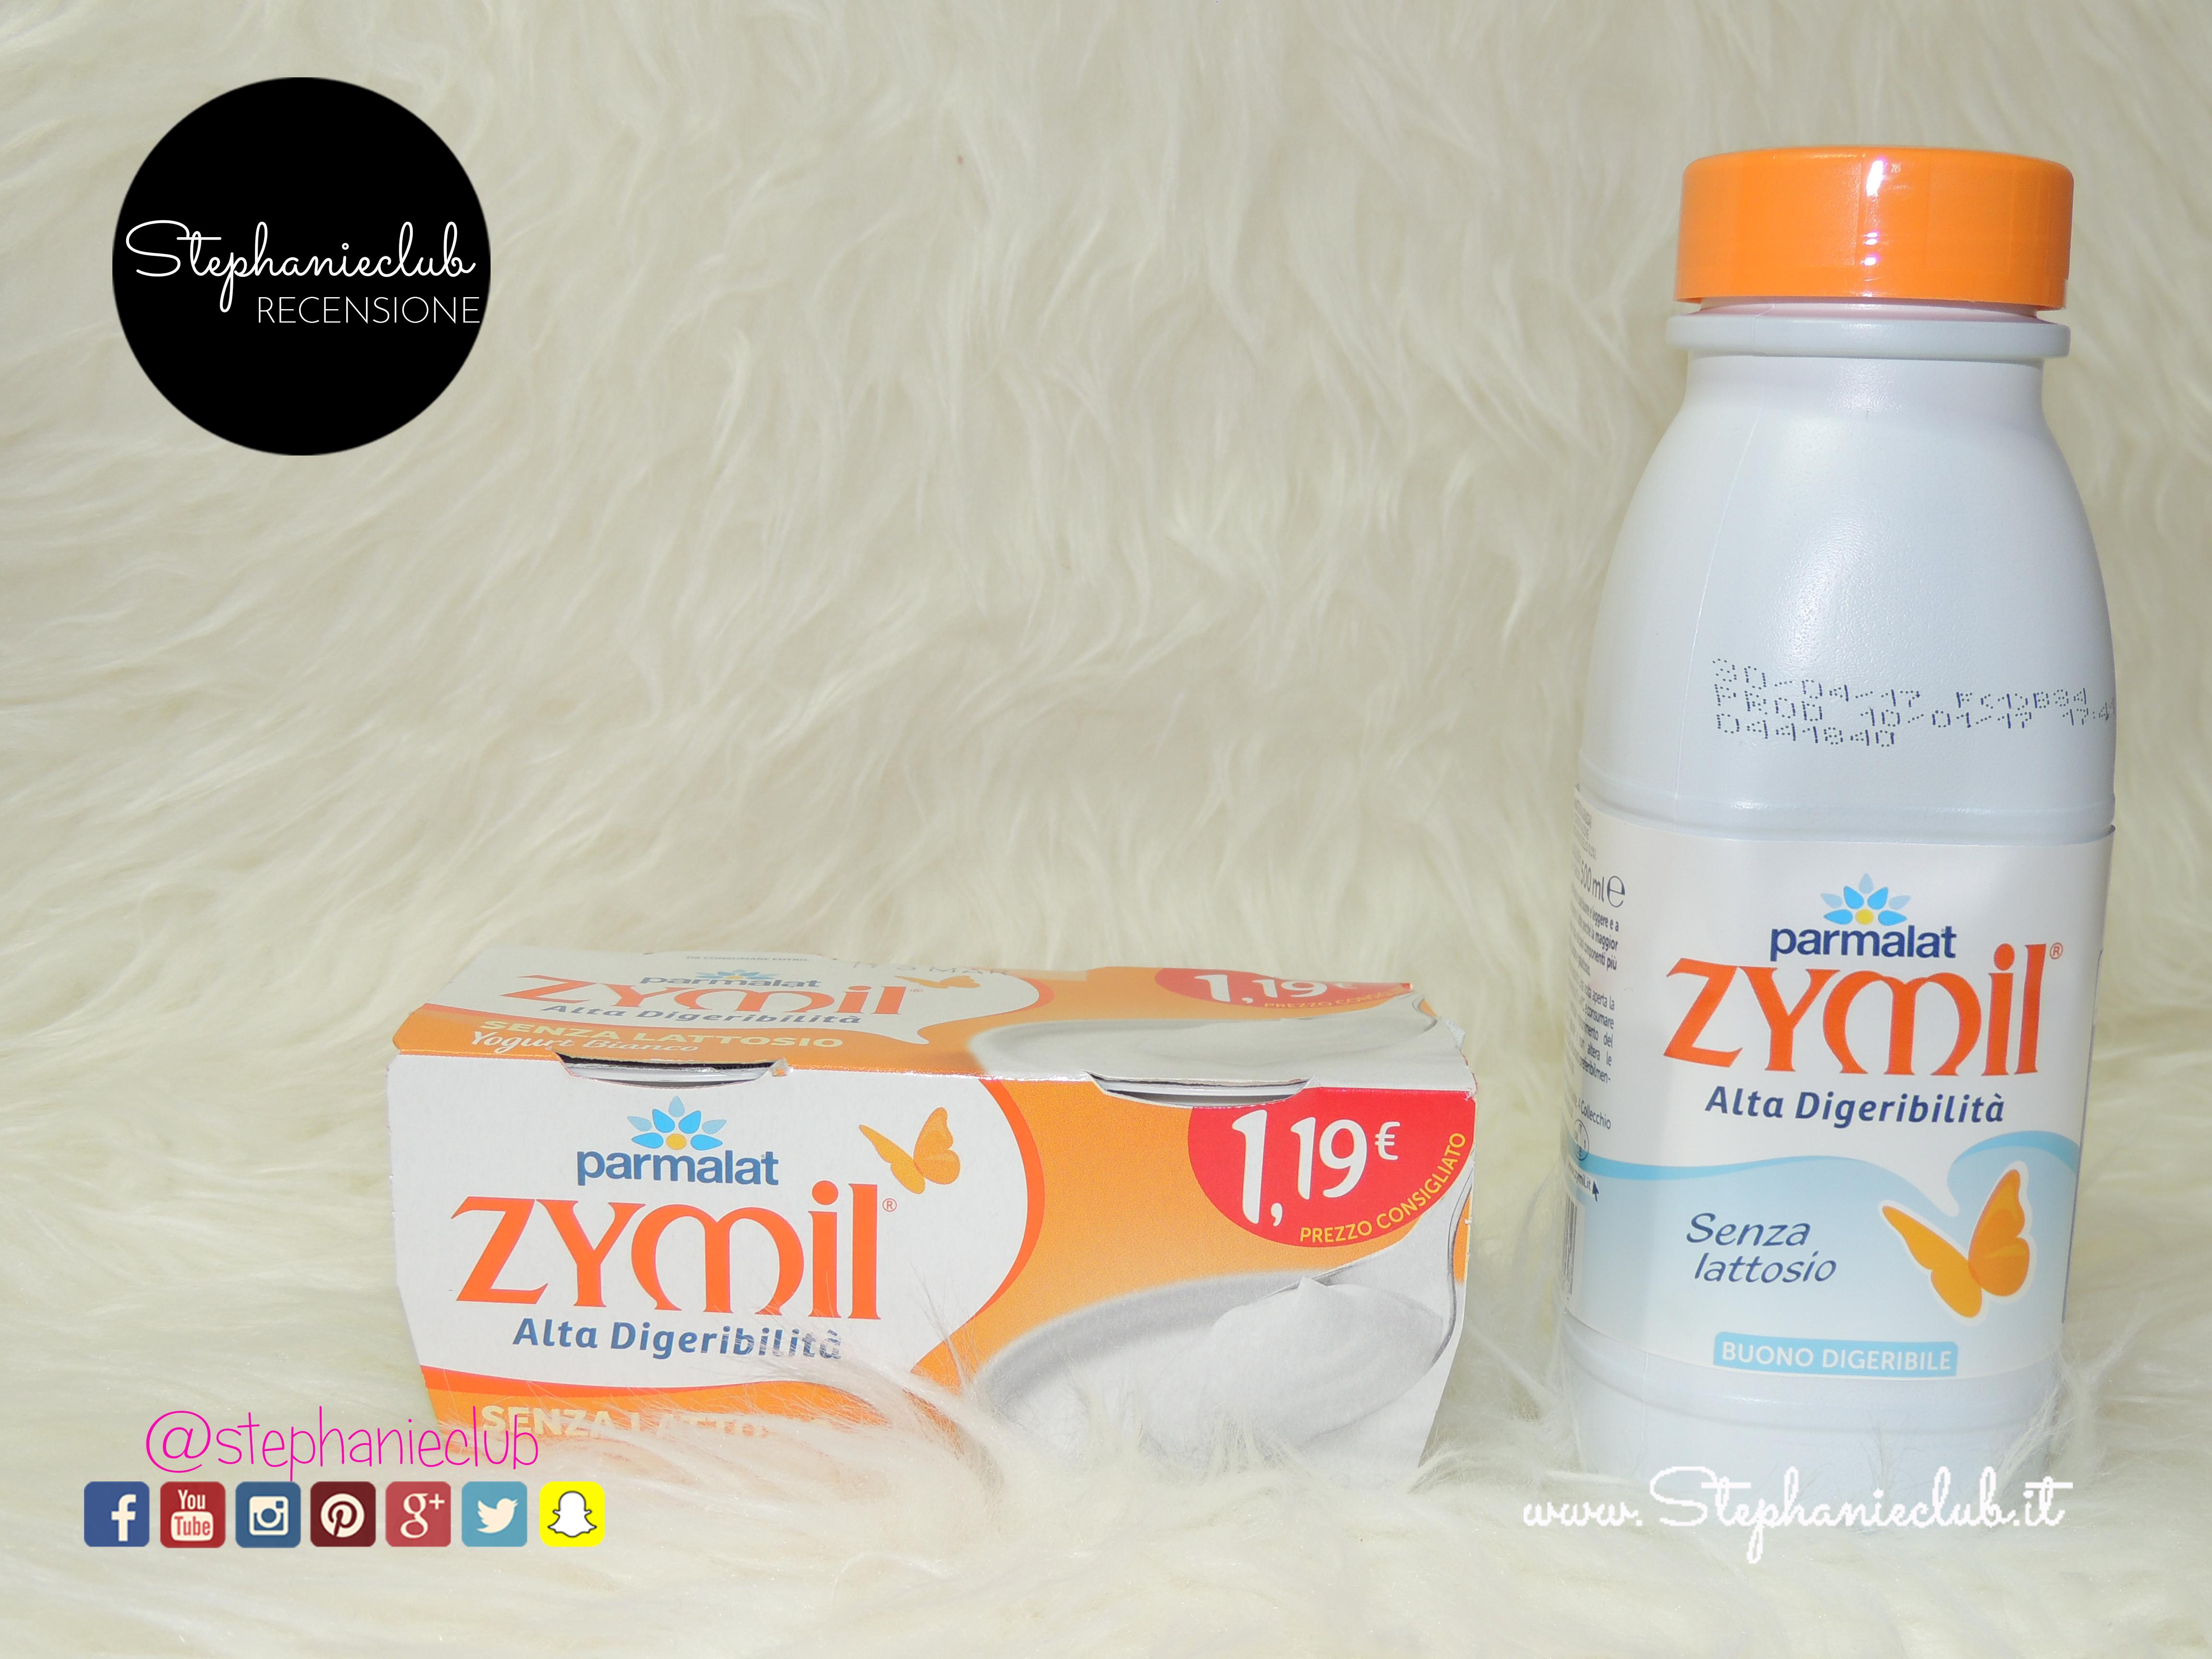 Recensione Latte e Yogurt Zymil Parmalat ad alta digeribilita'_02